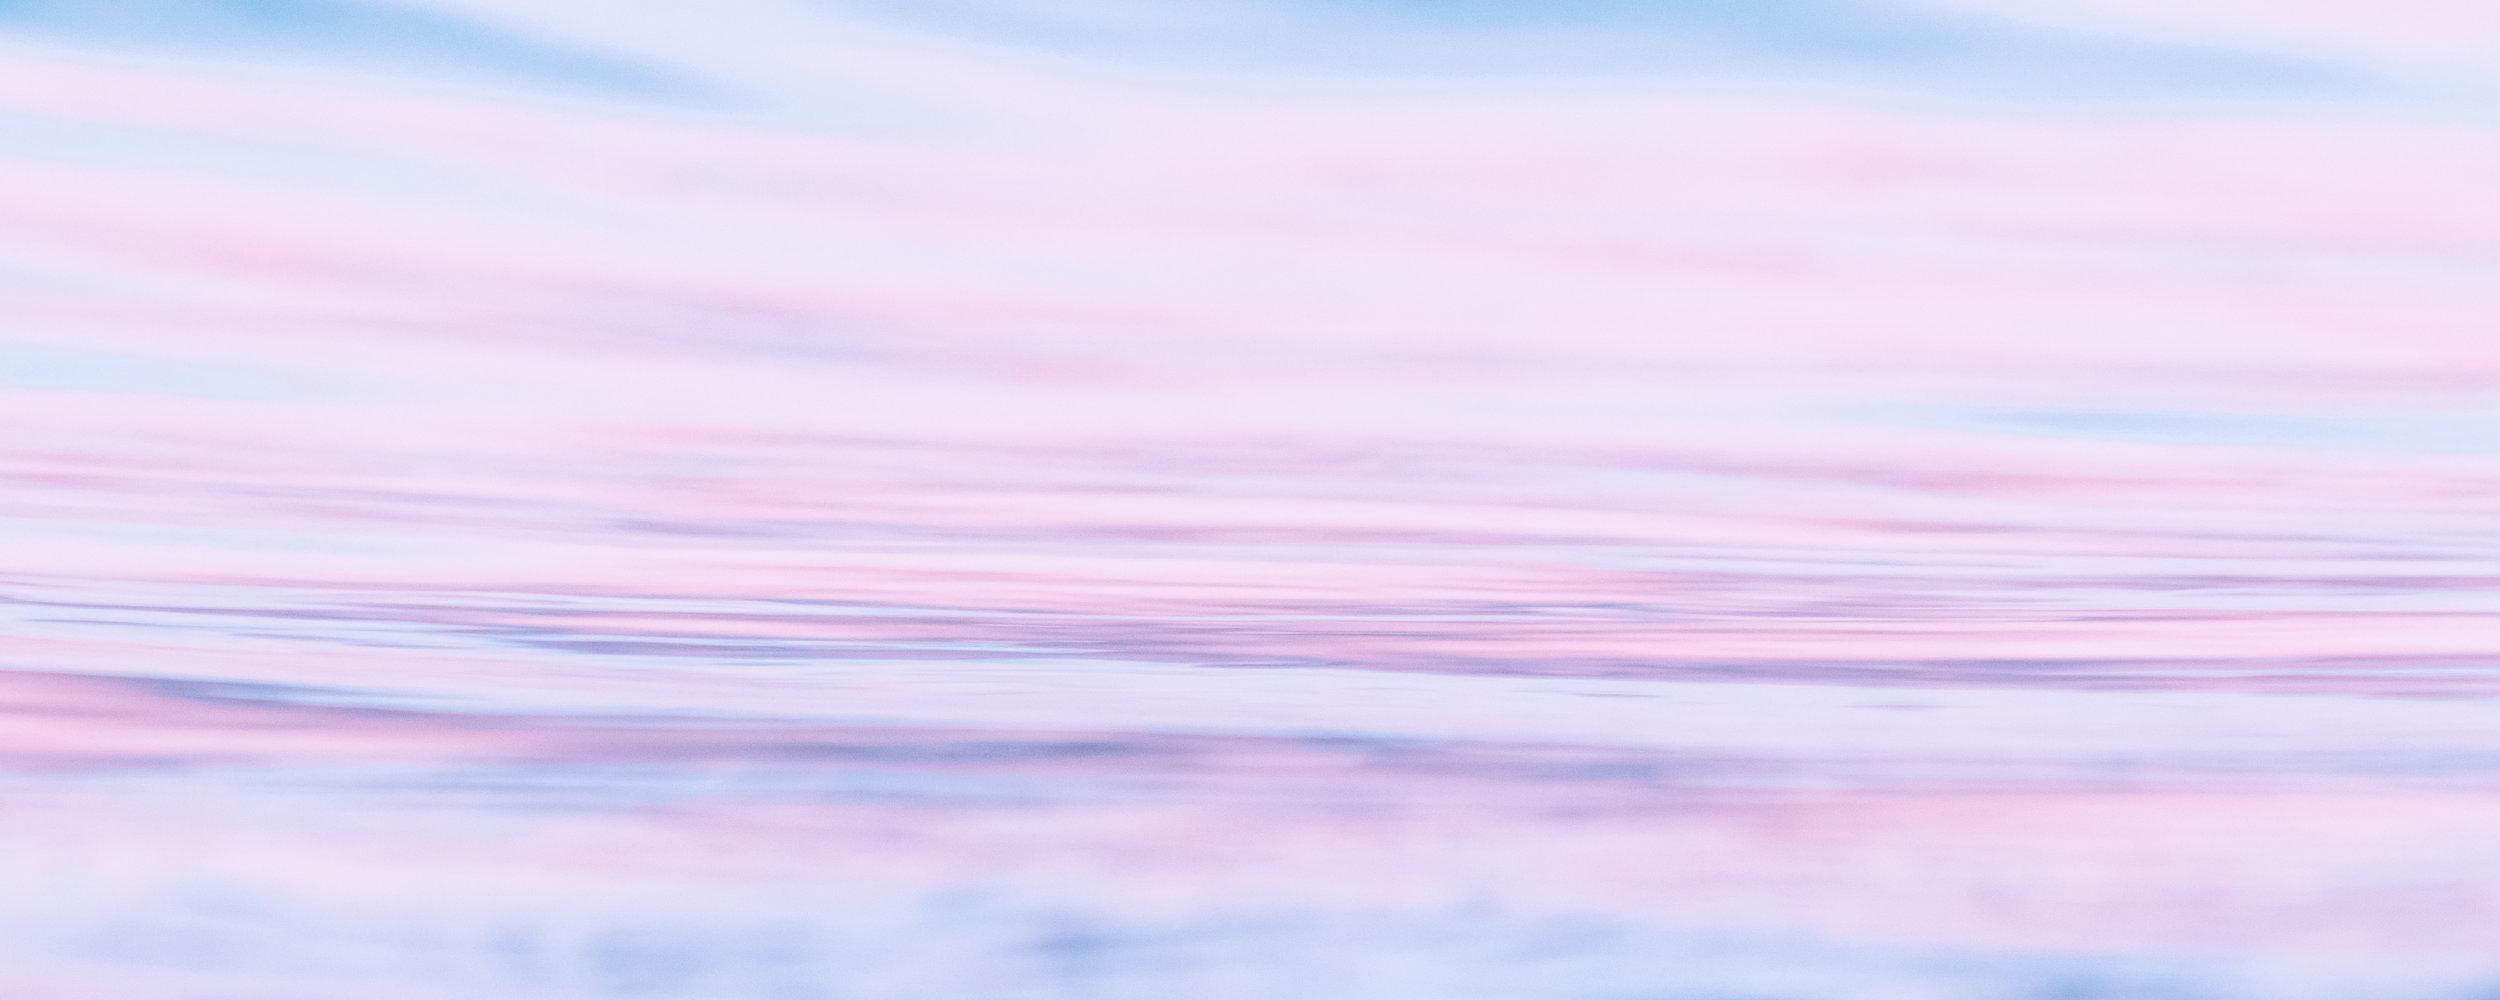 whimsical, magickal, wundertastical 🌺 🔮 � - a lil bit about faezi